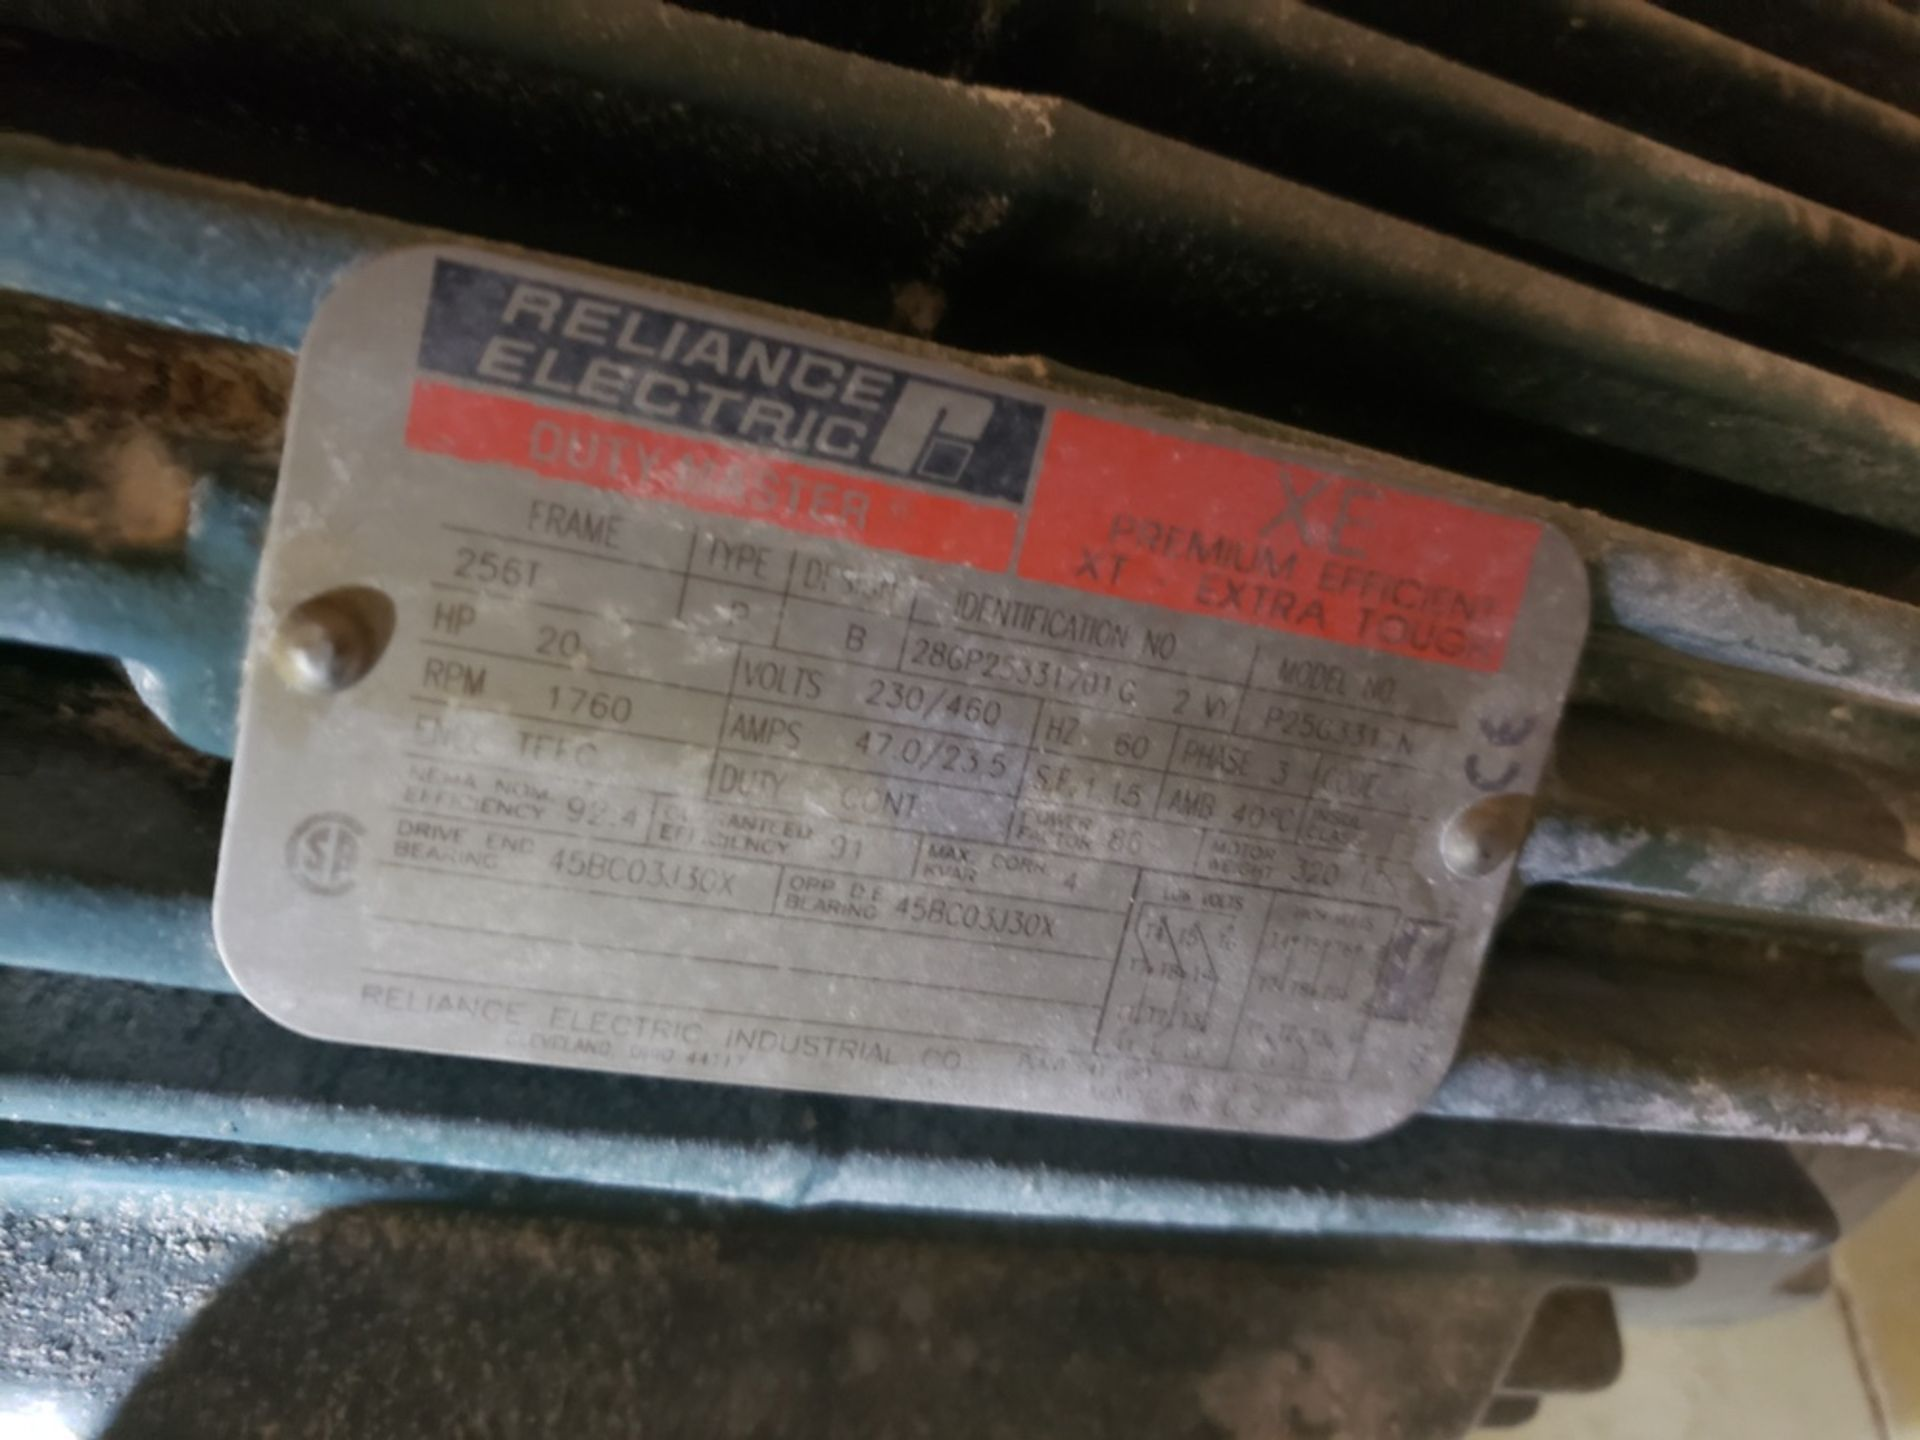 Lot 439 - 20 HP Blower Skid | Rig Fee: $400